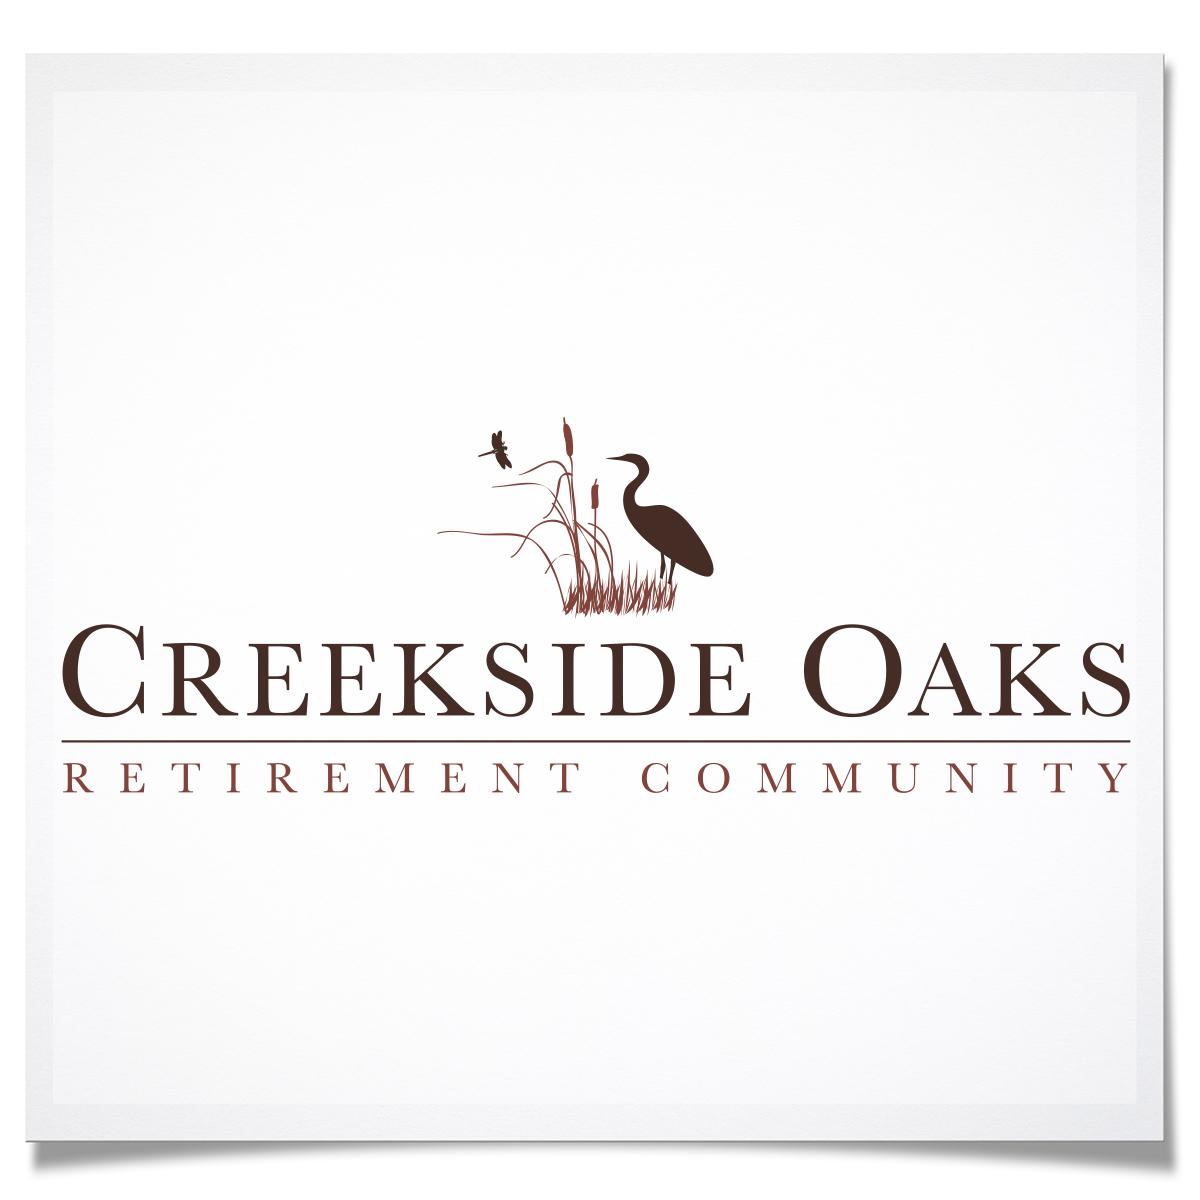 Creekside Oaks Retirement Community - Folsom, CA - Retirement Communities